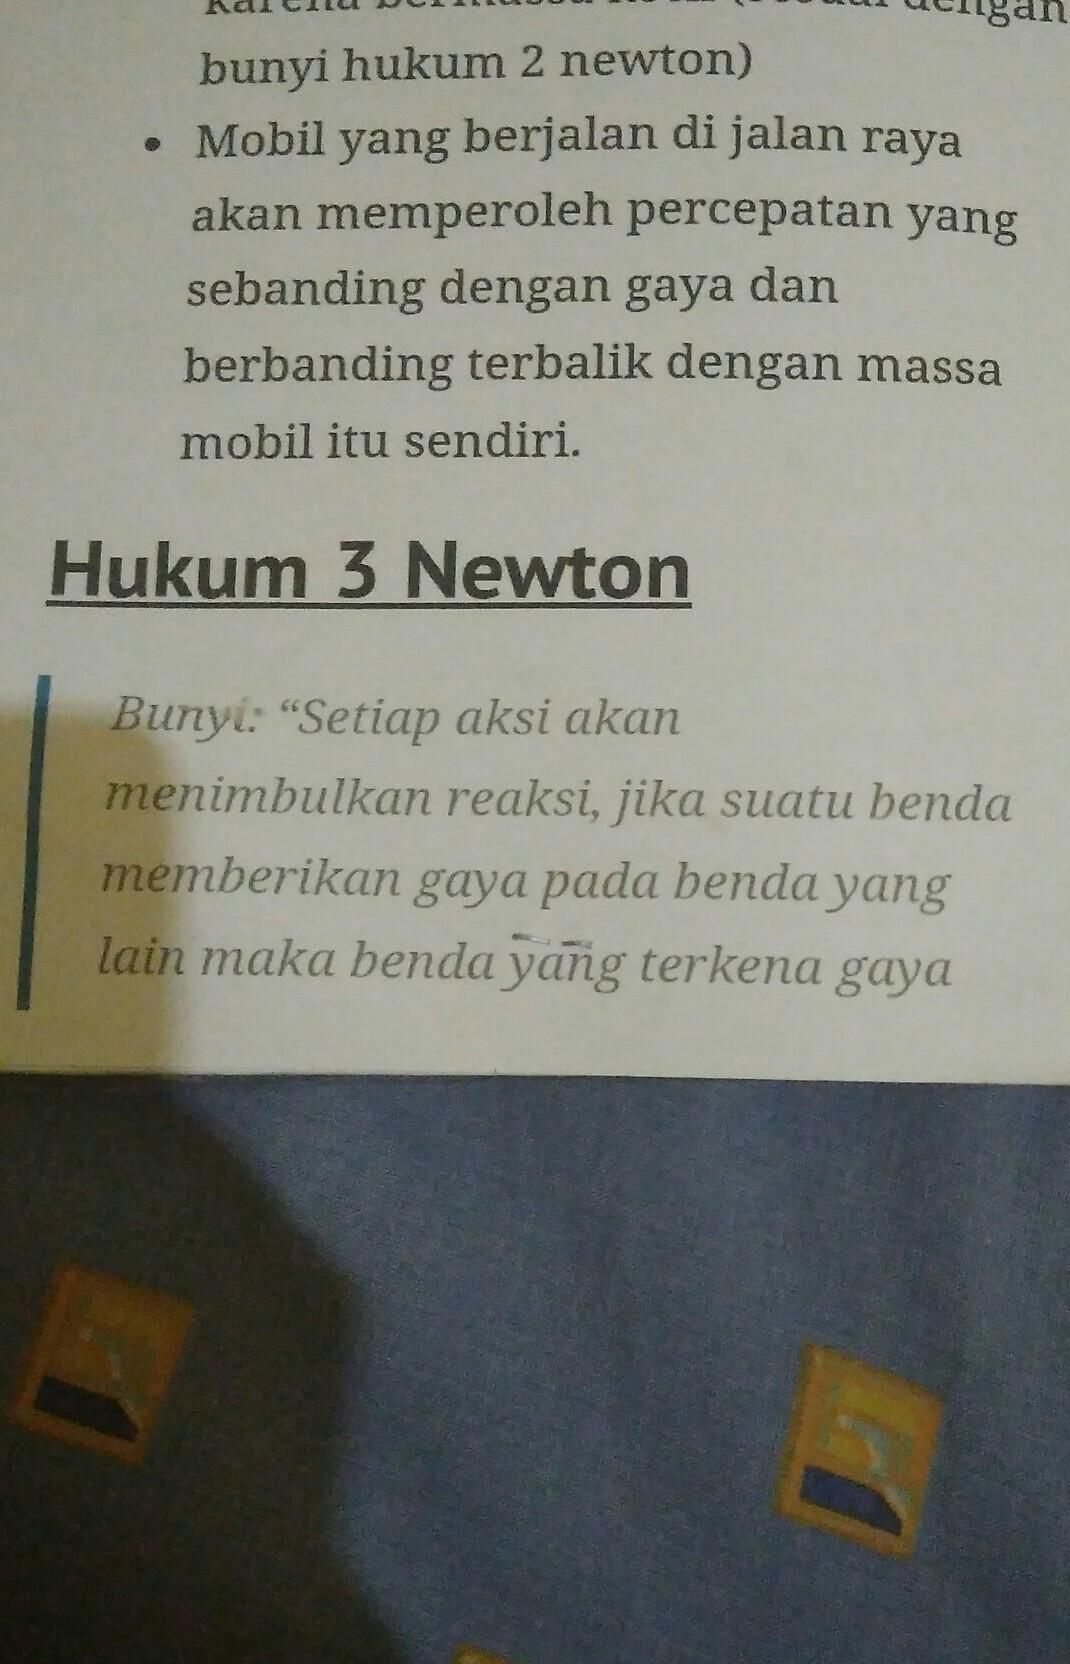 Tuliskan Bunyi Hukum 3 Newton : tuliskan, bunyi, hukum, newton, Bagaimana, Bunyi, Hukum, Newton?, Berikan, Contoh, Penerapannya., Brainly.co.id